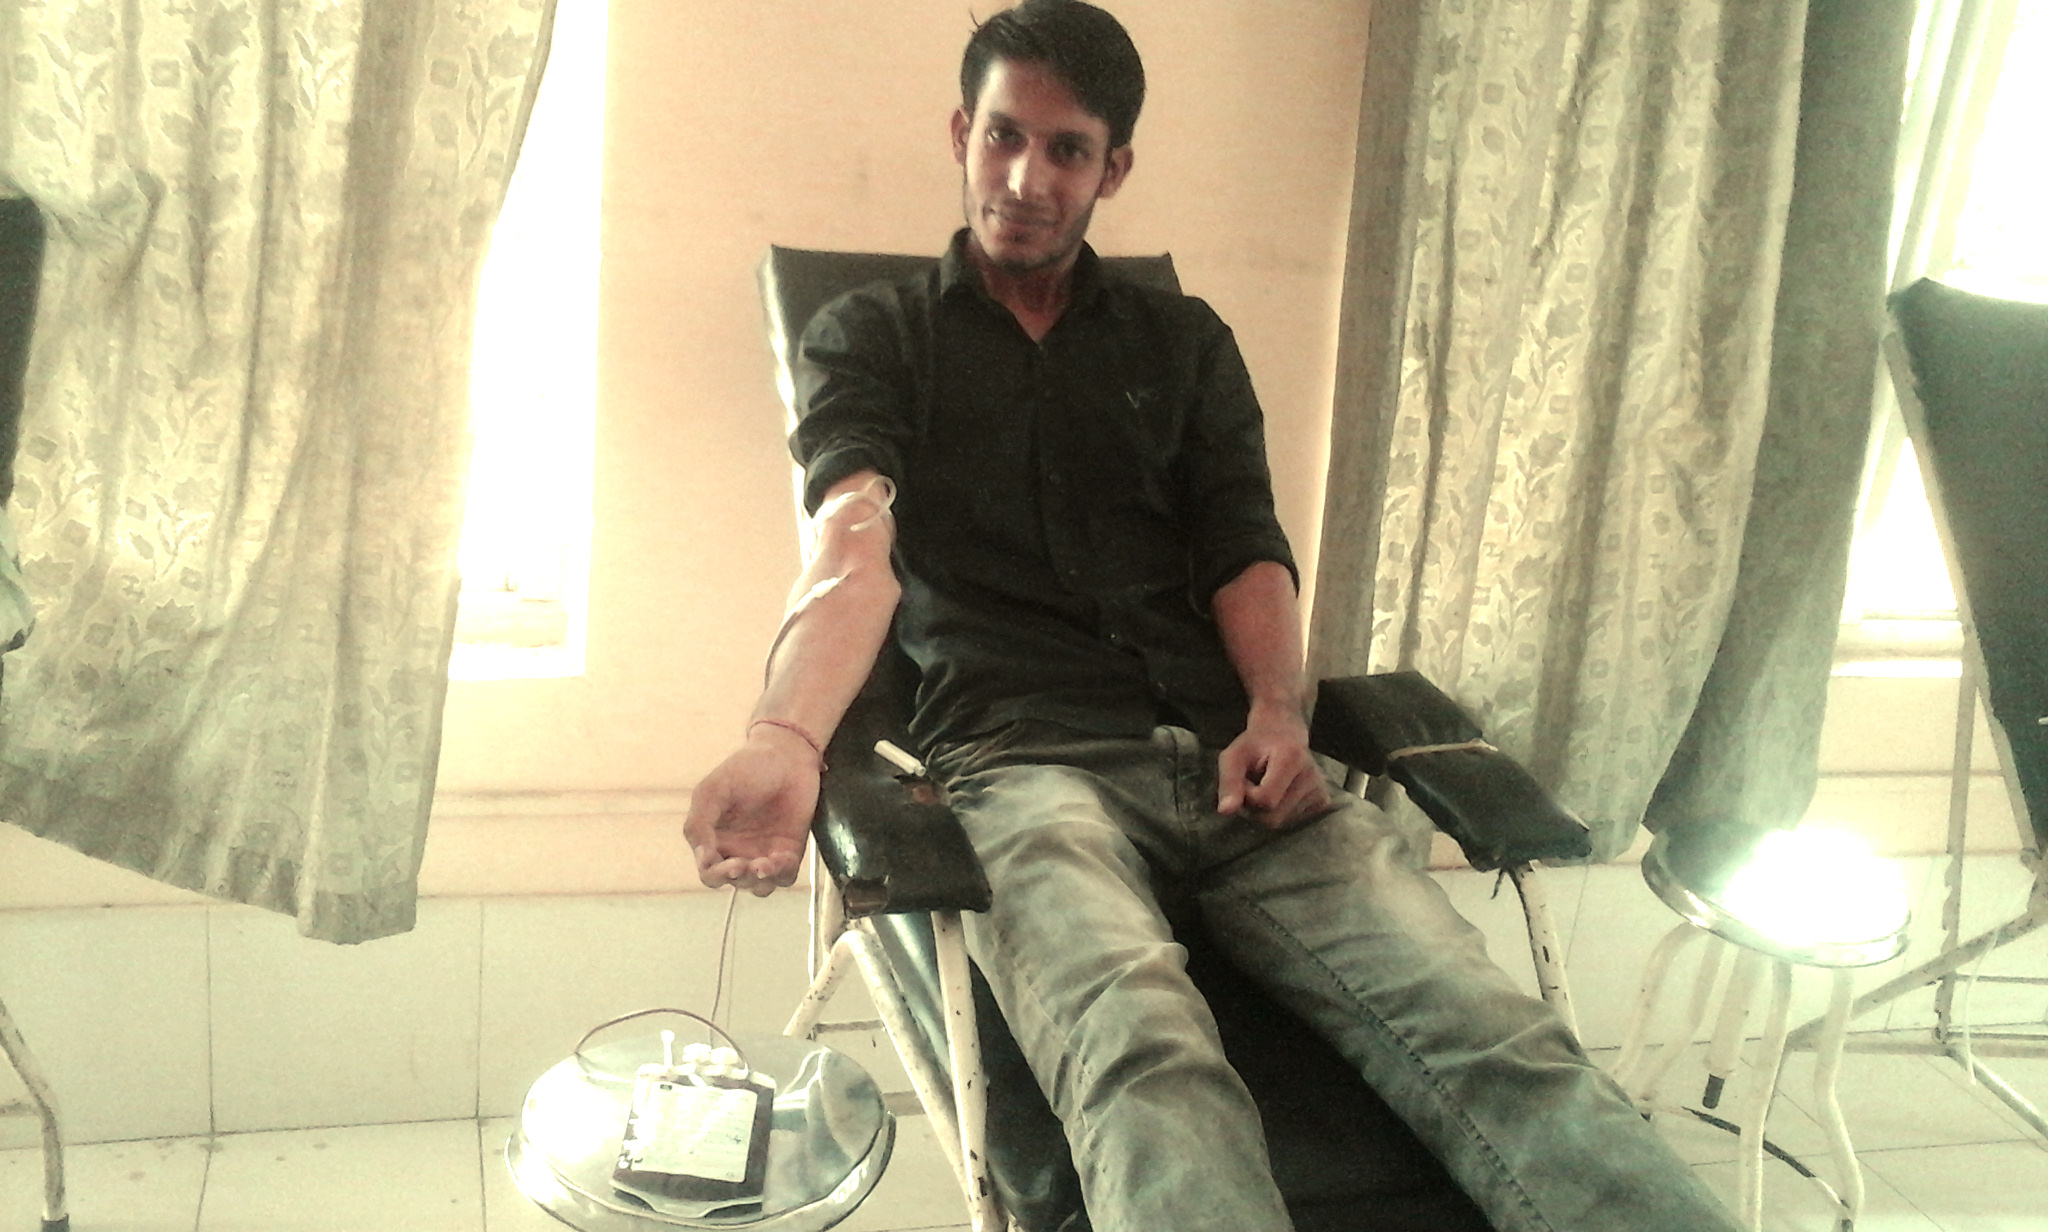 Donating my O+ve blood to Uma Devi Neupane at Nepal Redcross Society Regional Blood Transfusion Center, Biratnagar, Nepal